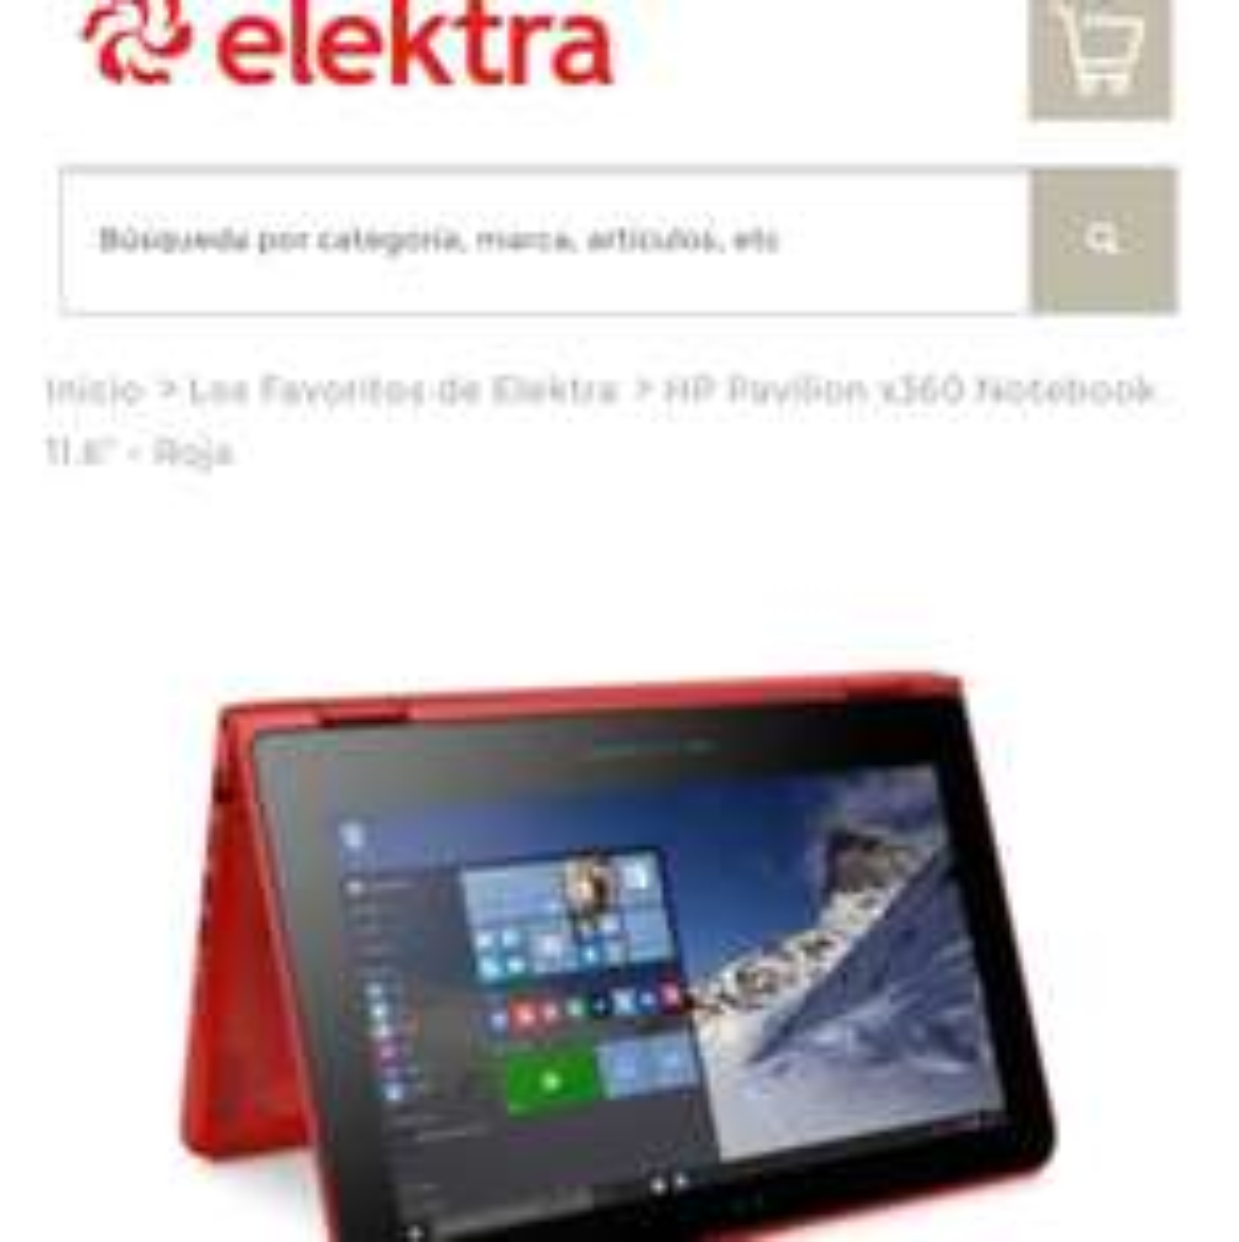 "Elektra en línea: HP Pavilion x360 Notebook 11.6"" - Roja"